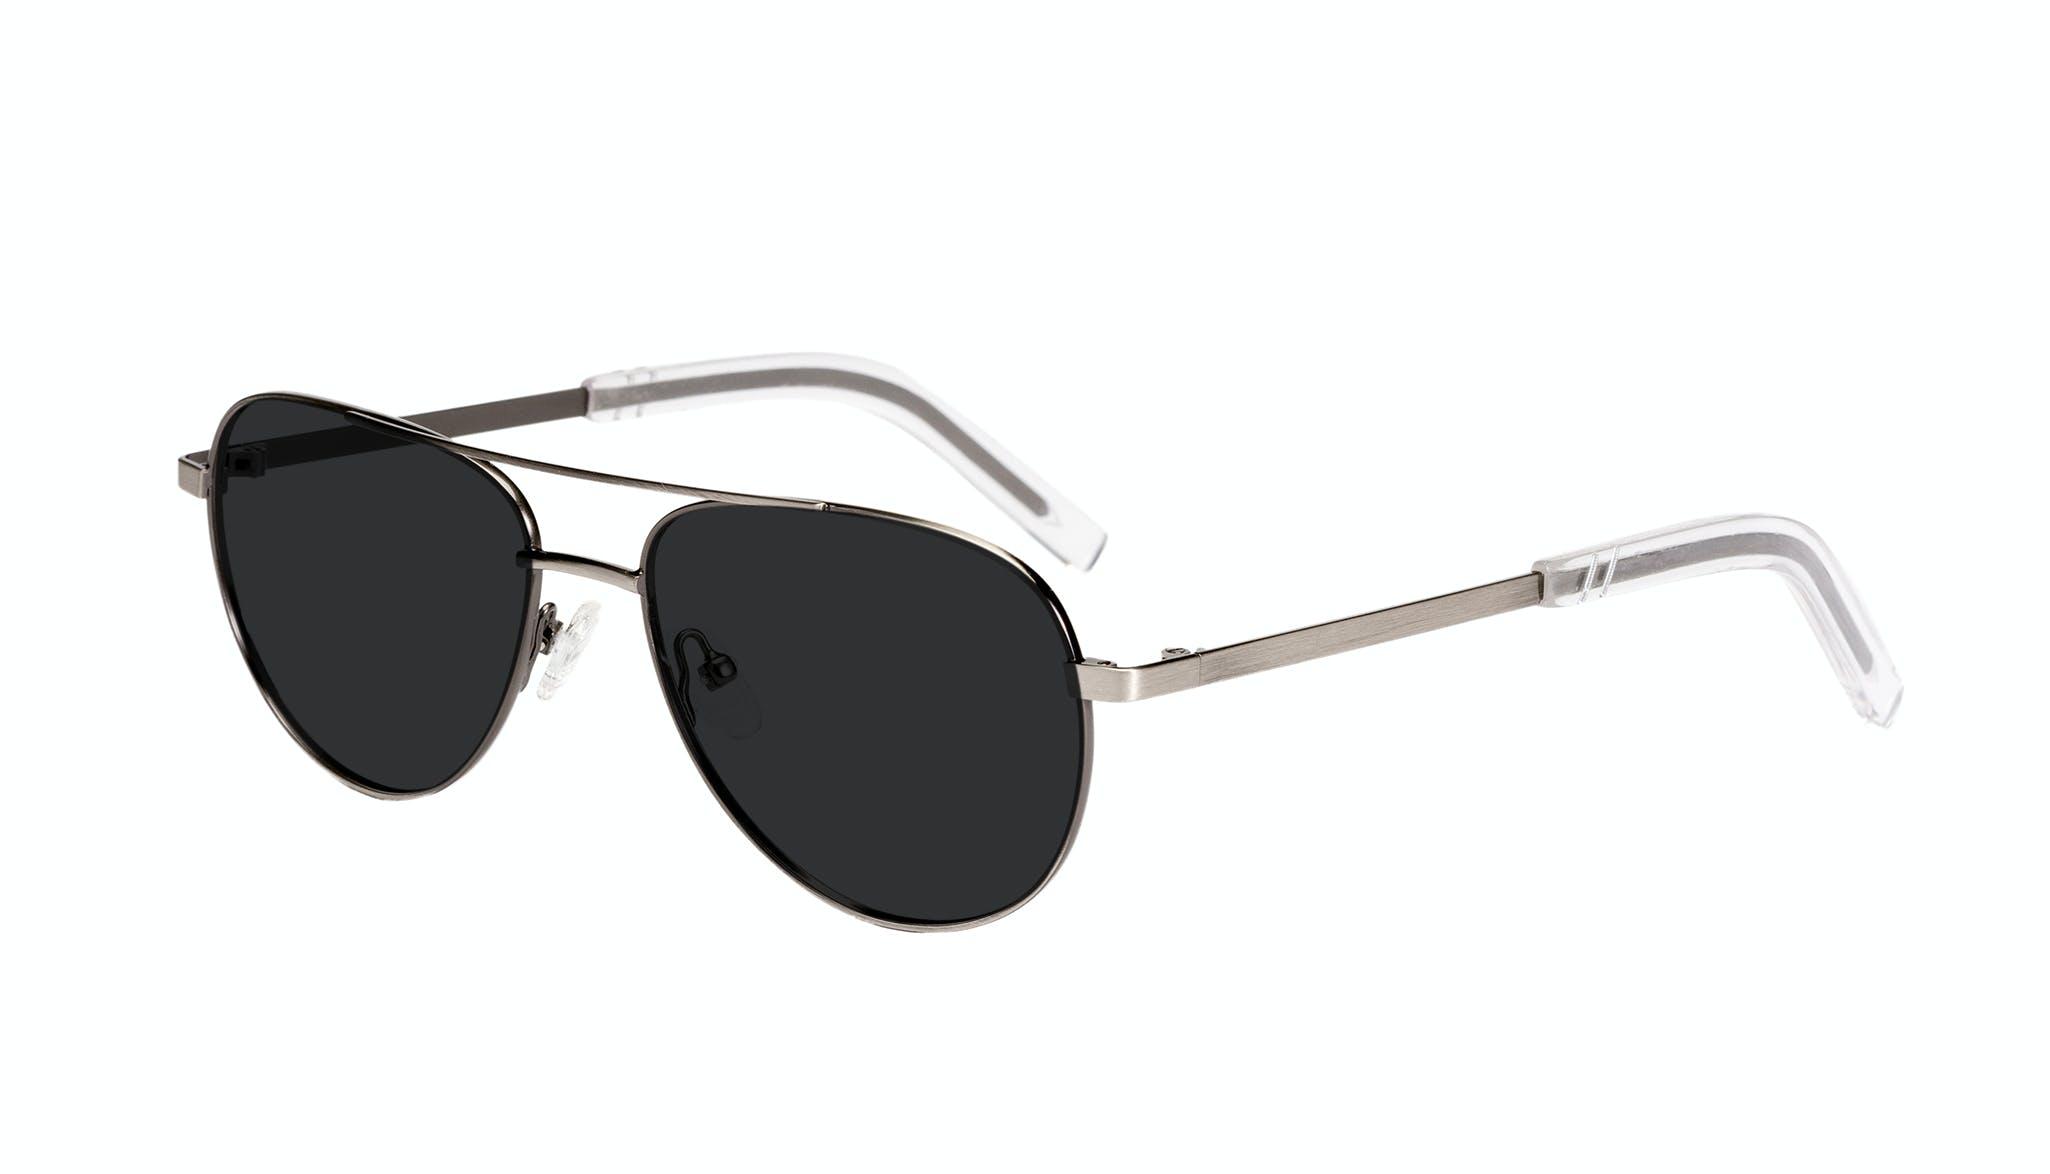 Affordable Fashion Glasses Aviator Sunglasses Men Devoted Silver Tilt